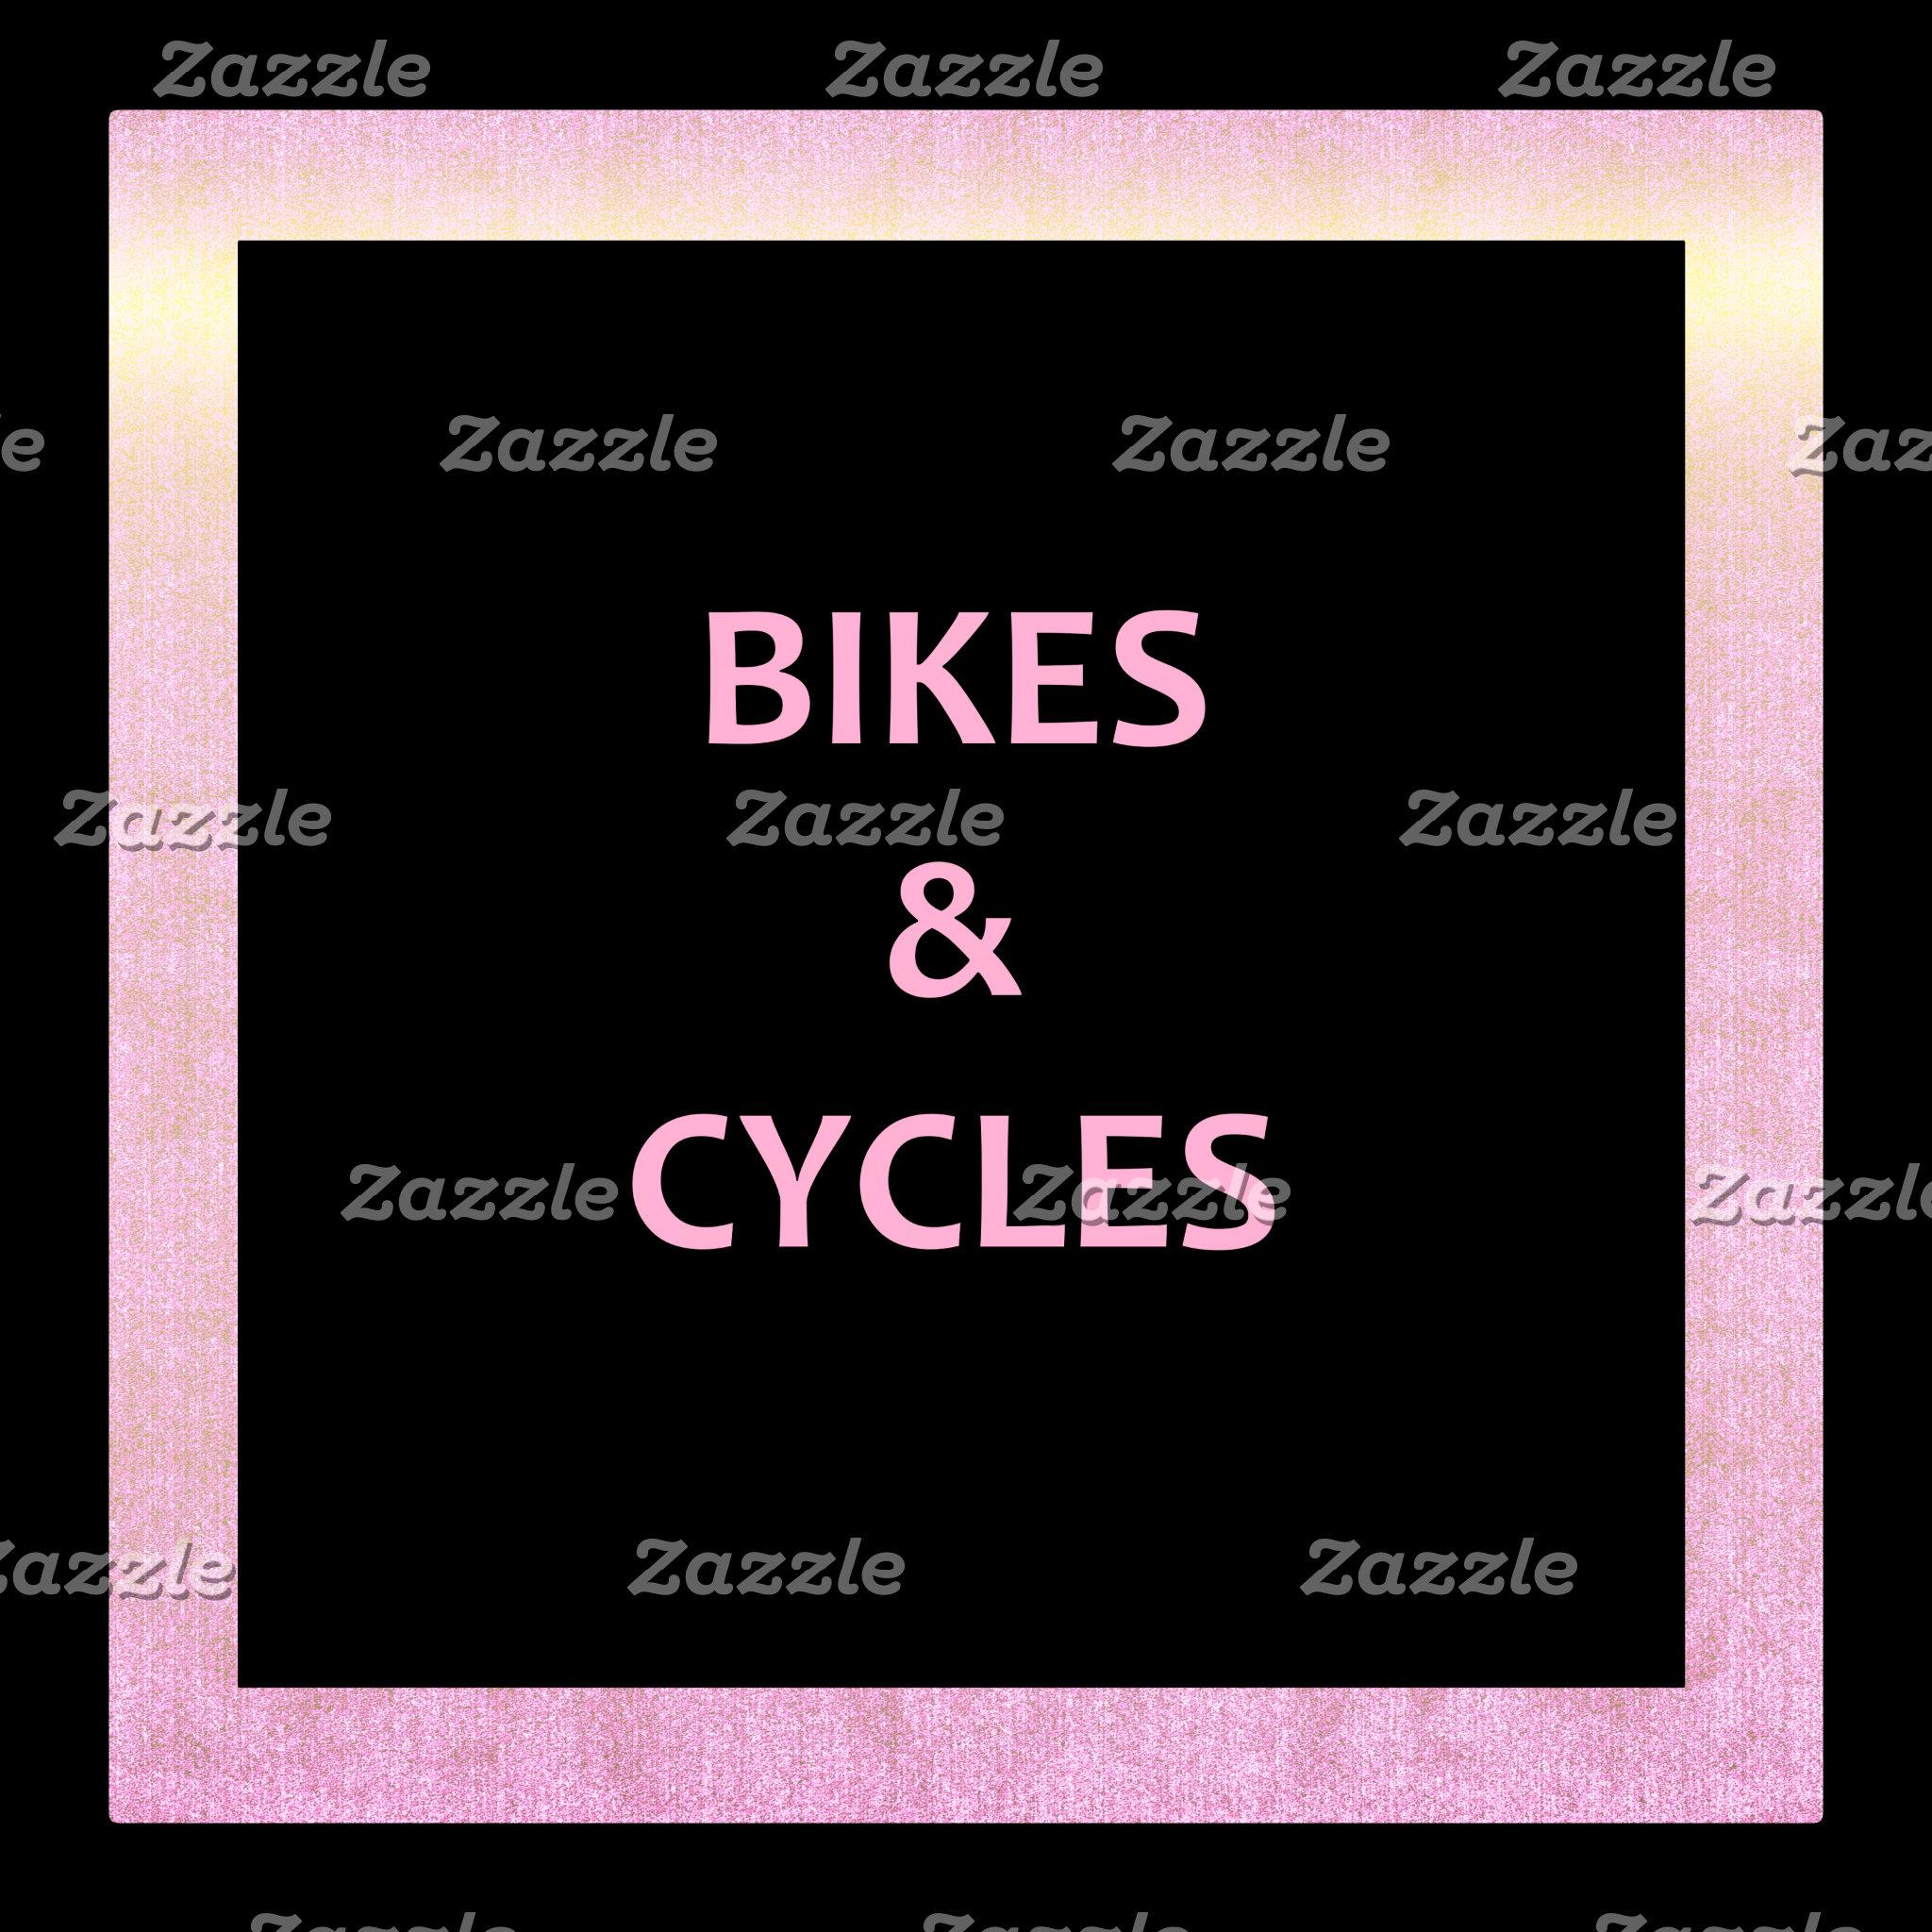 Bikes & Cycles